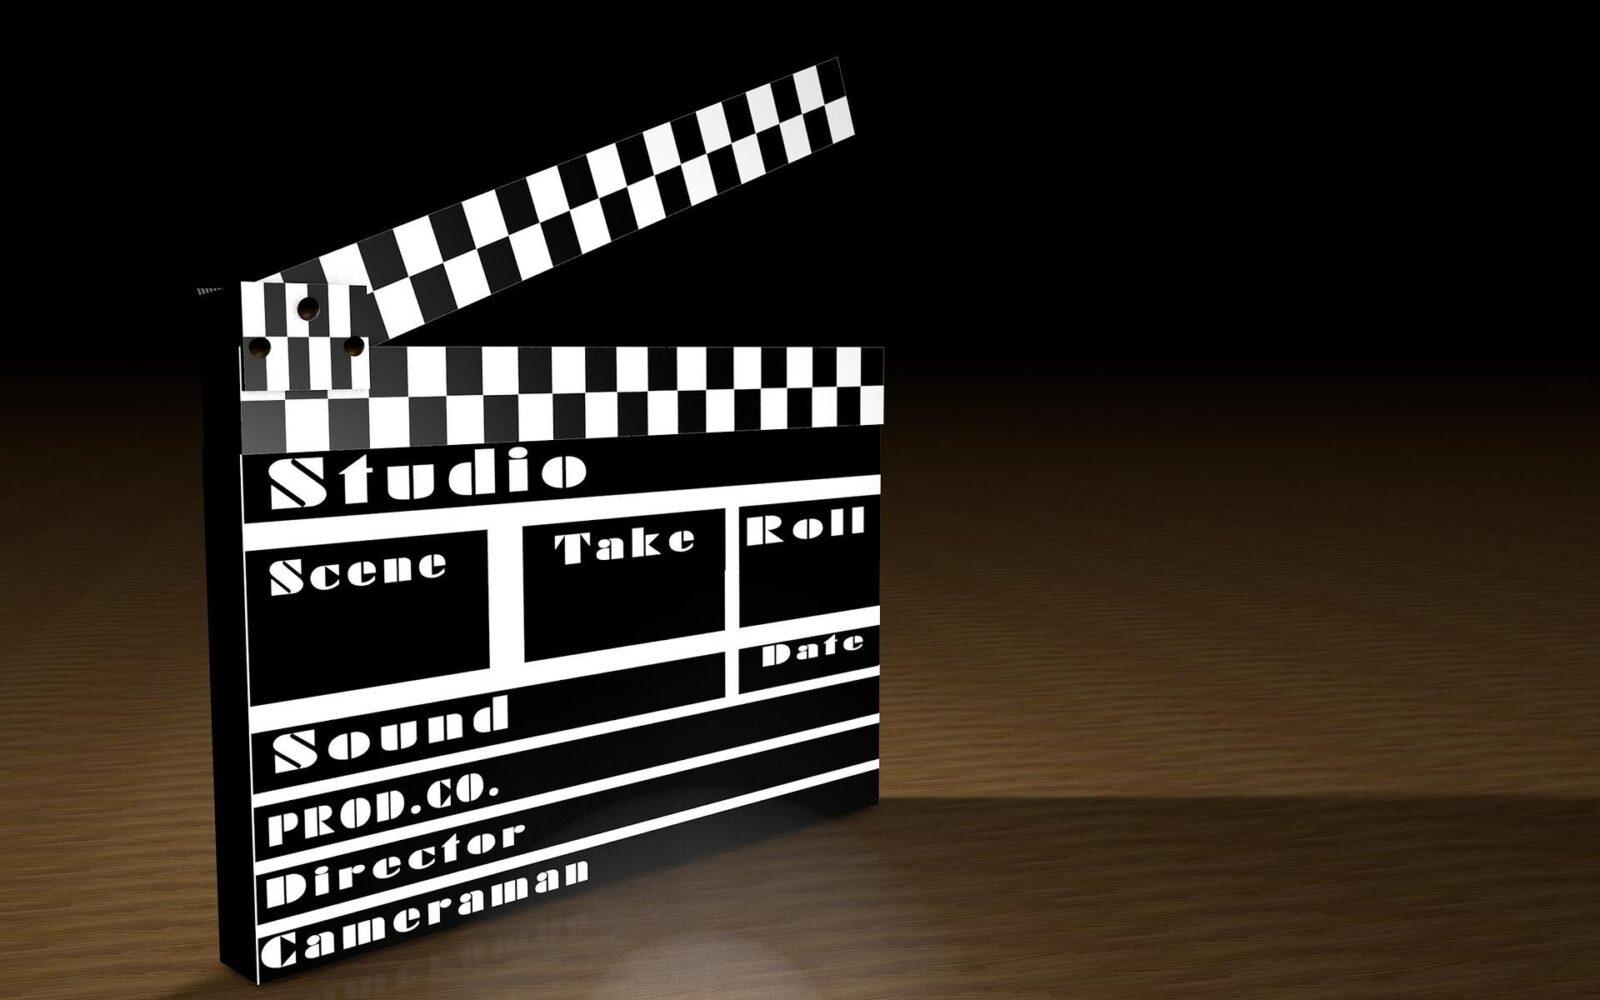 filmmaking terminology